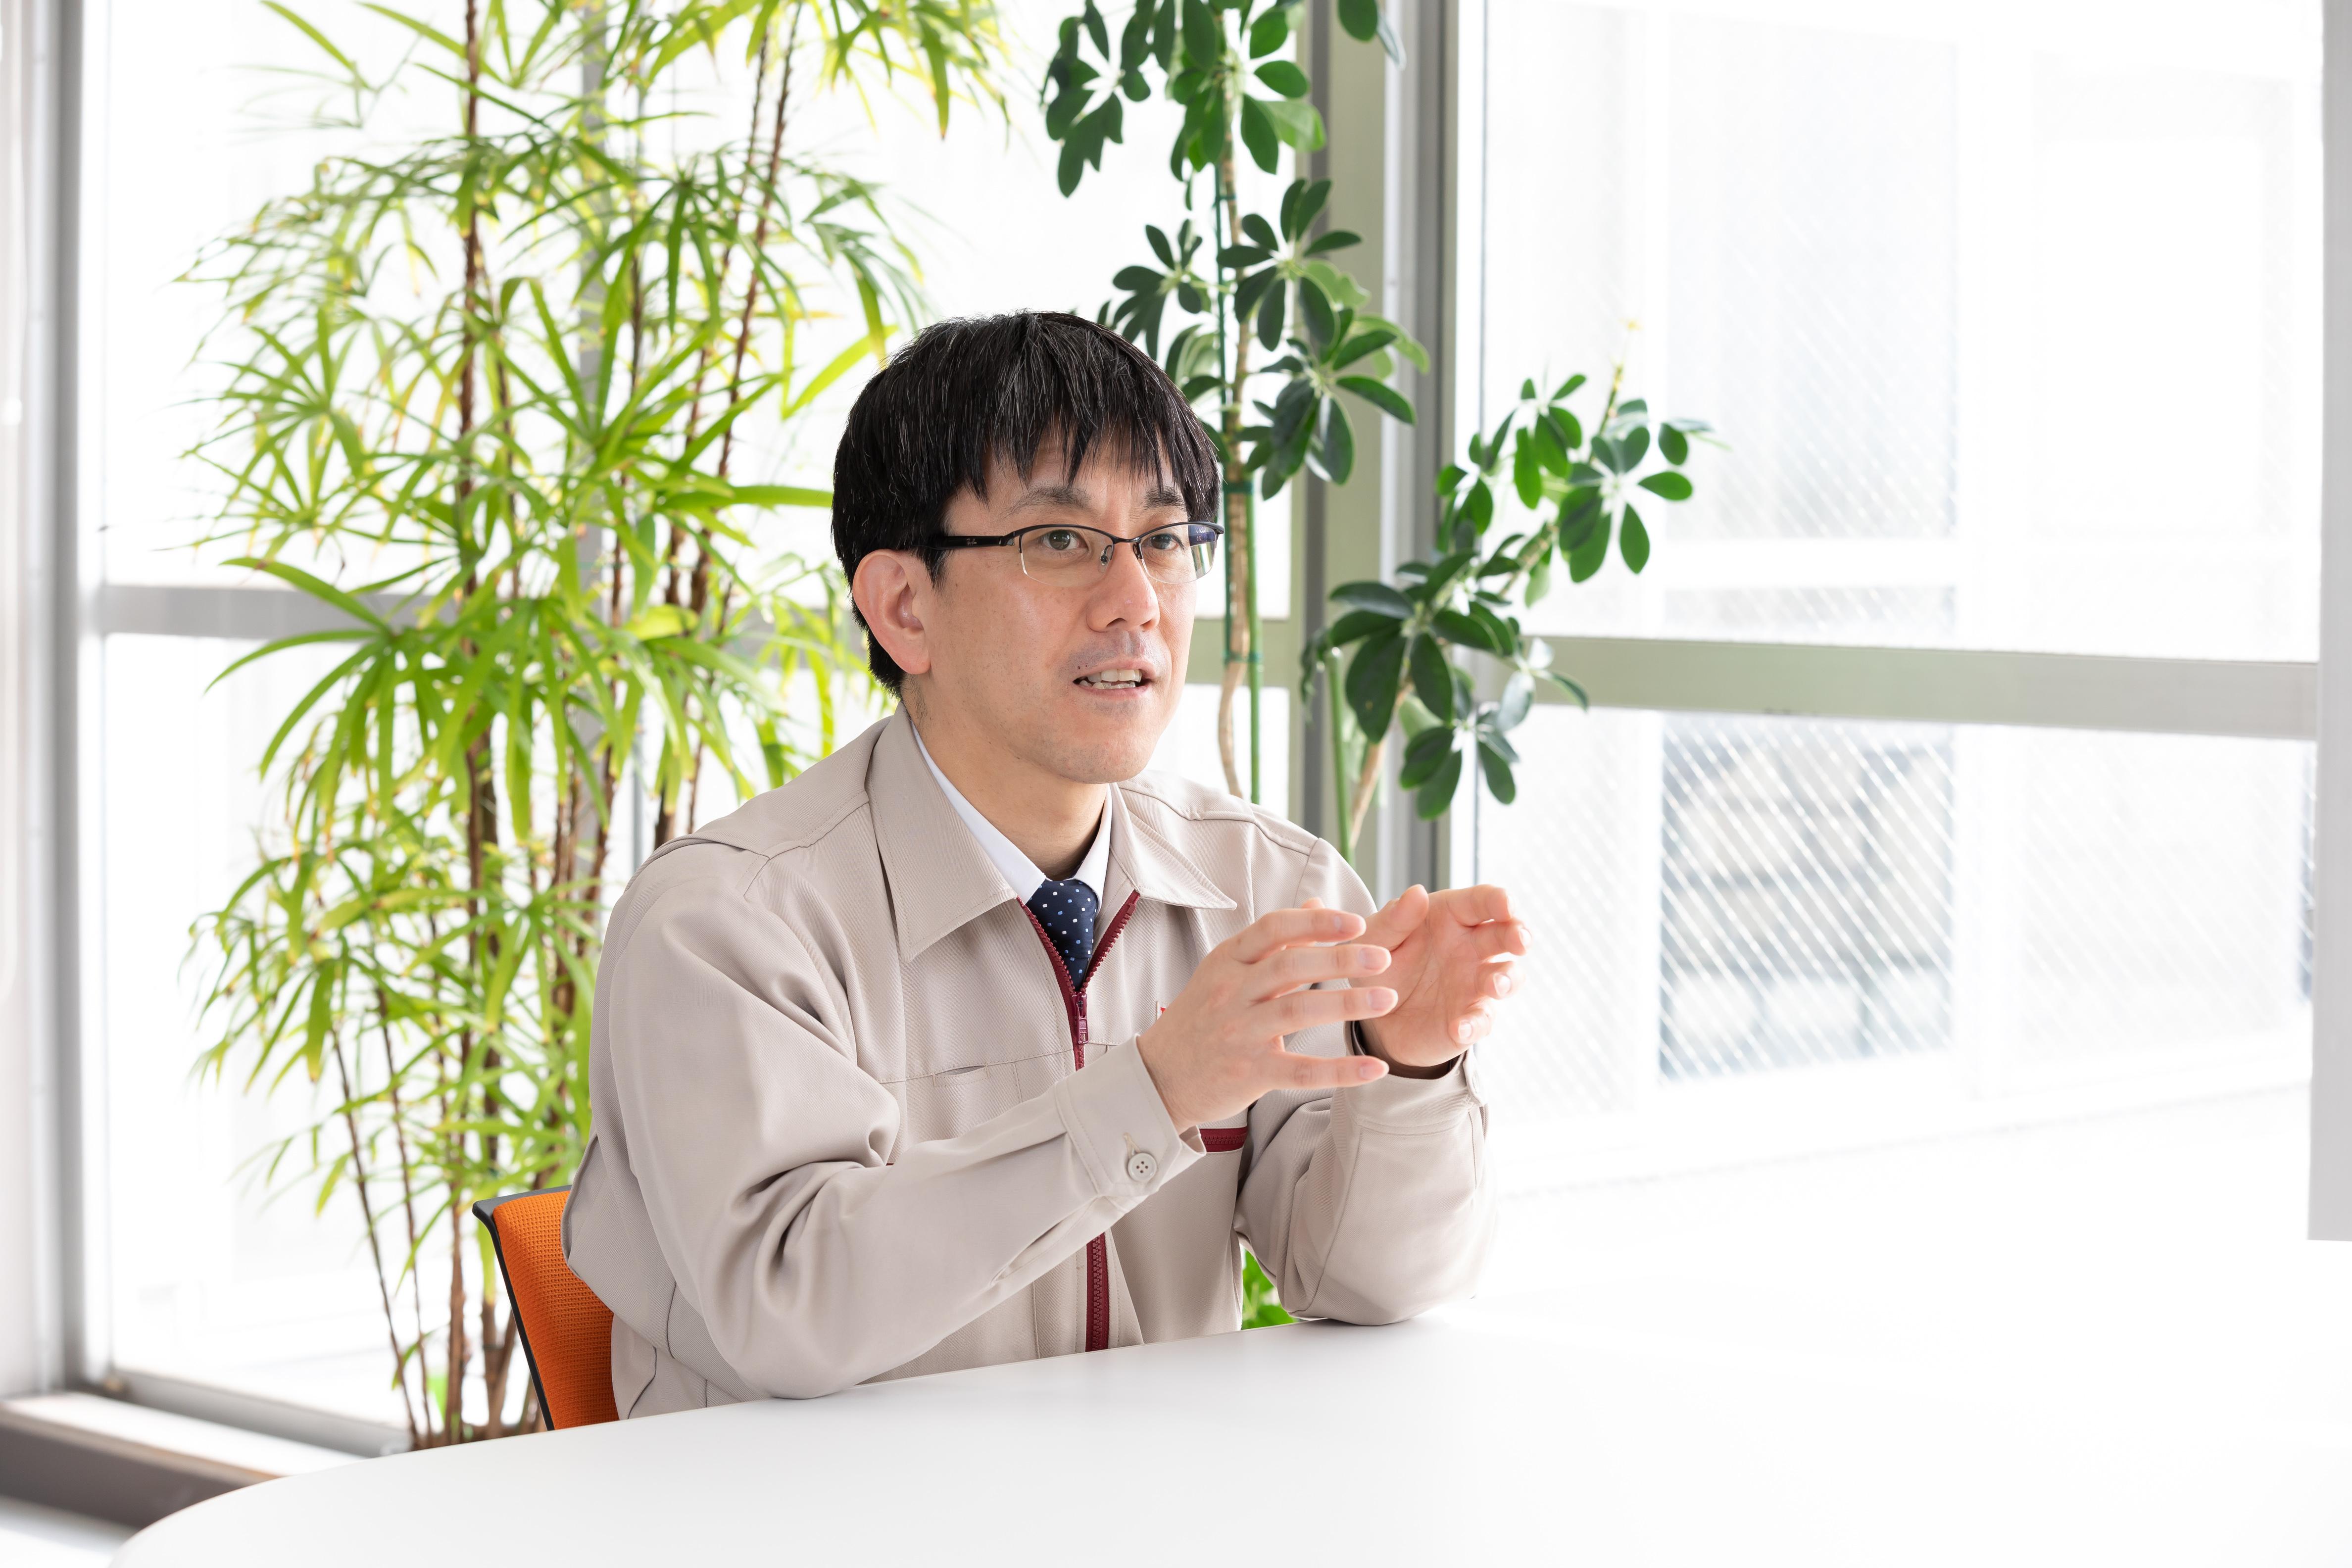 東芝ライテック株式会社 UV技術開発部門 グループ長 田内 亮彦氏